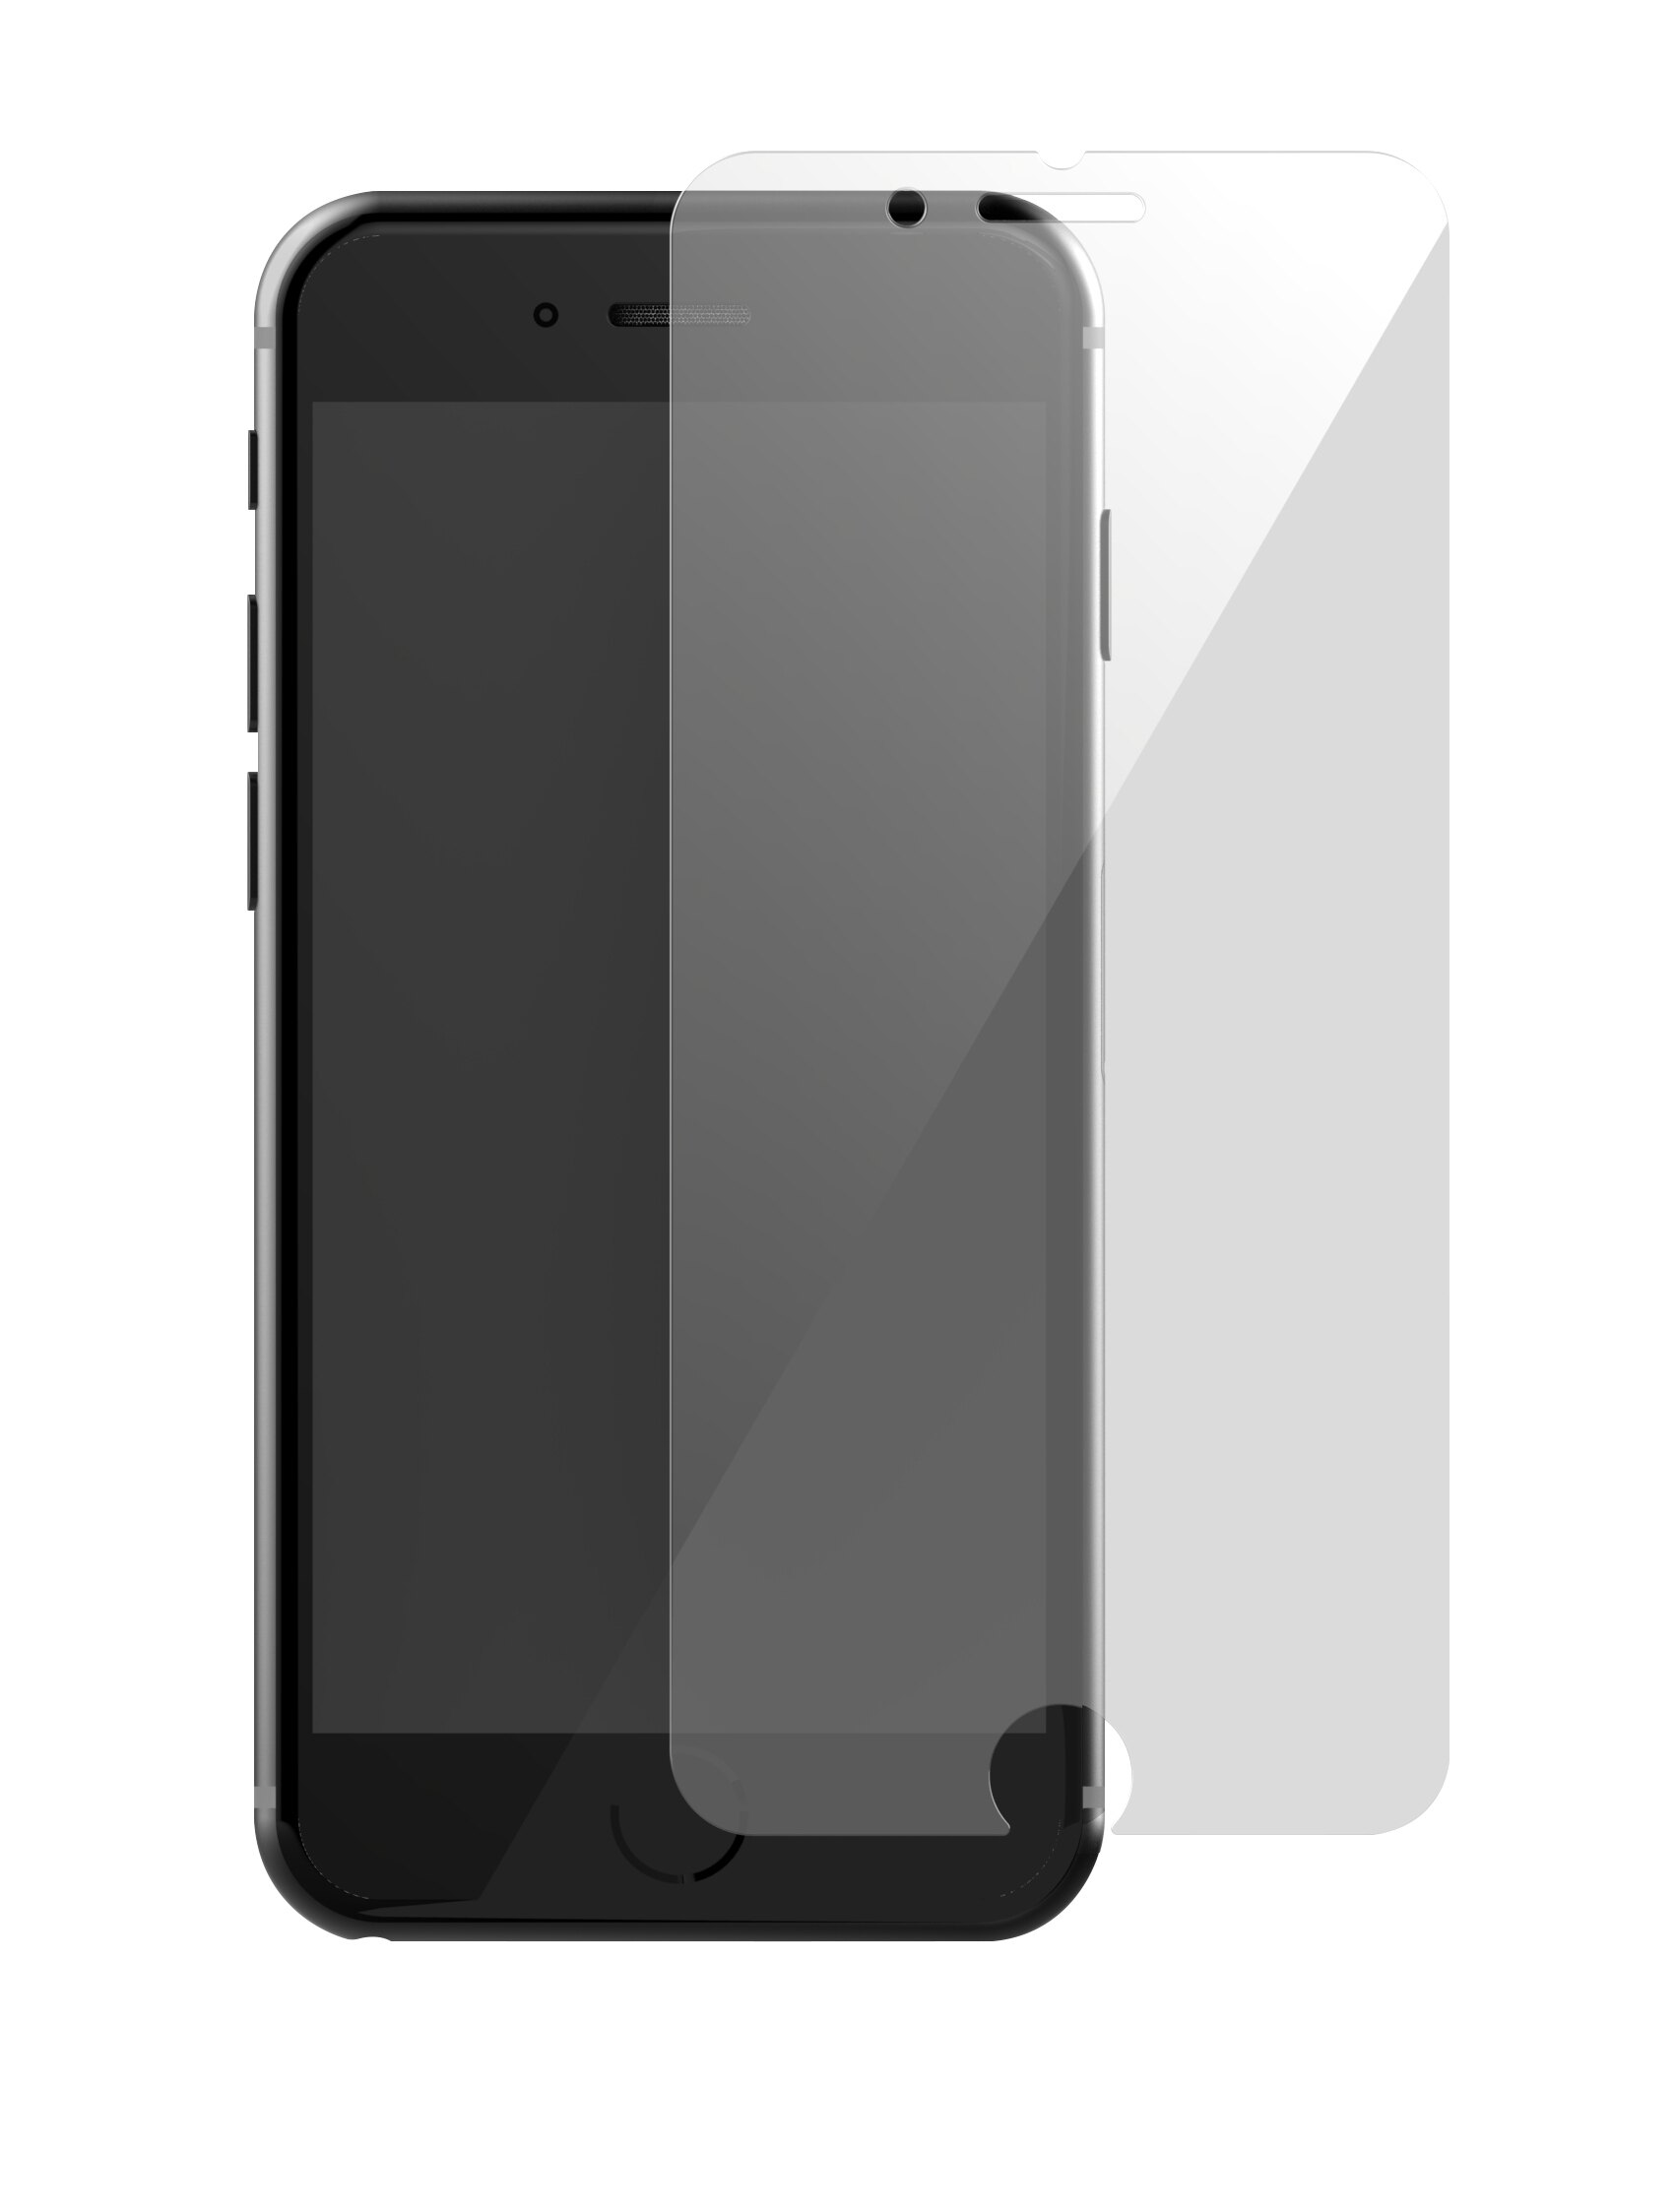 TEAMGROUP十銓科技 iPhone7日本ASAHI旭硝子玻璃保護貼(Japan Asahi AGC Glass) 2.5D/9H (等同於康寧玻璃等級) 4.7吋透明版